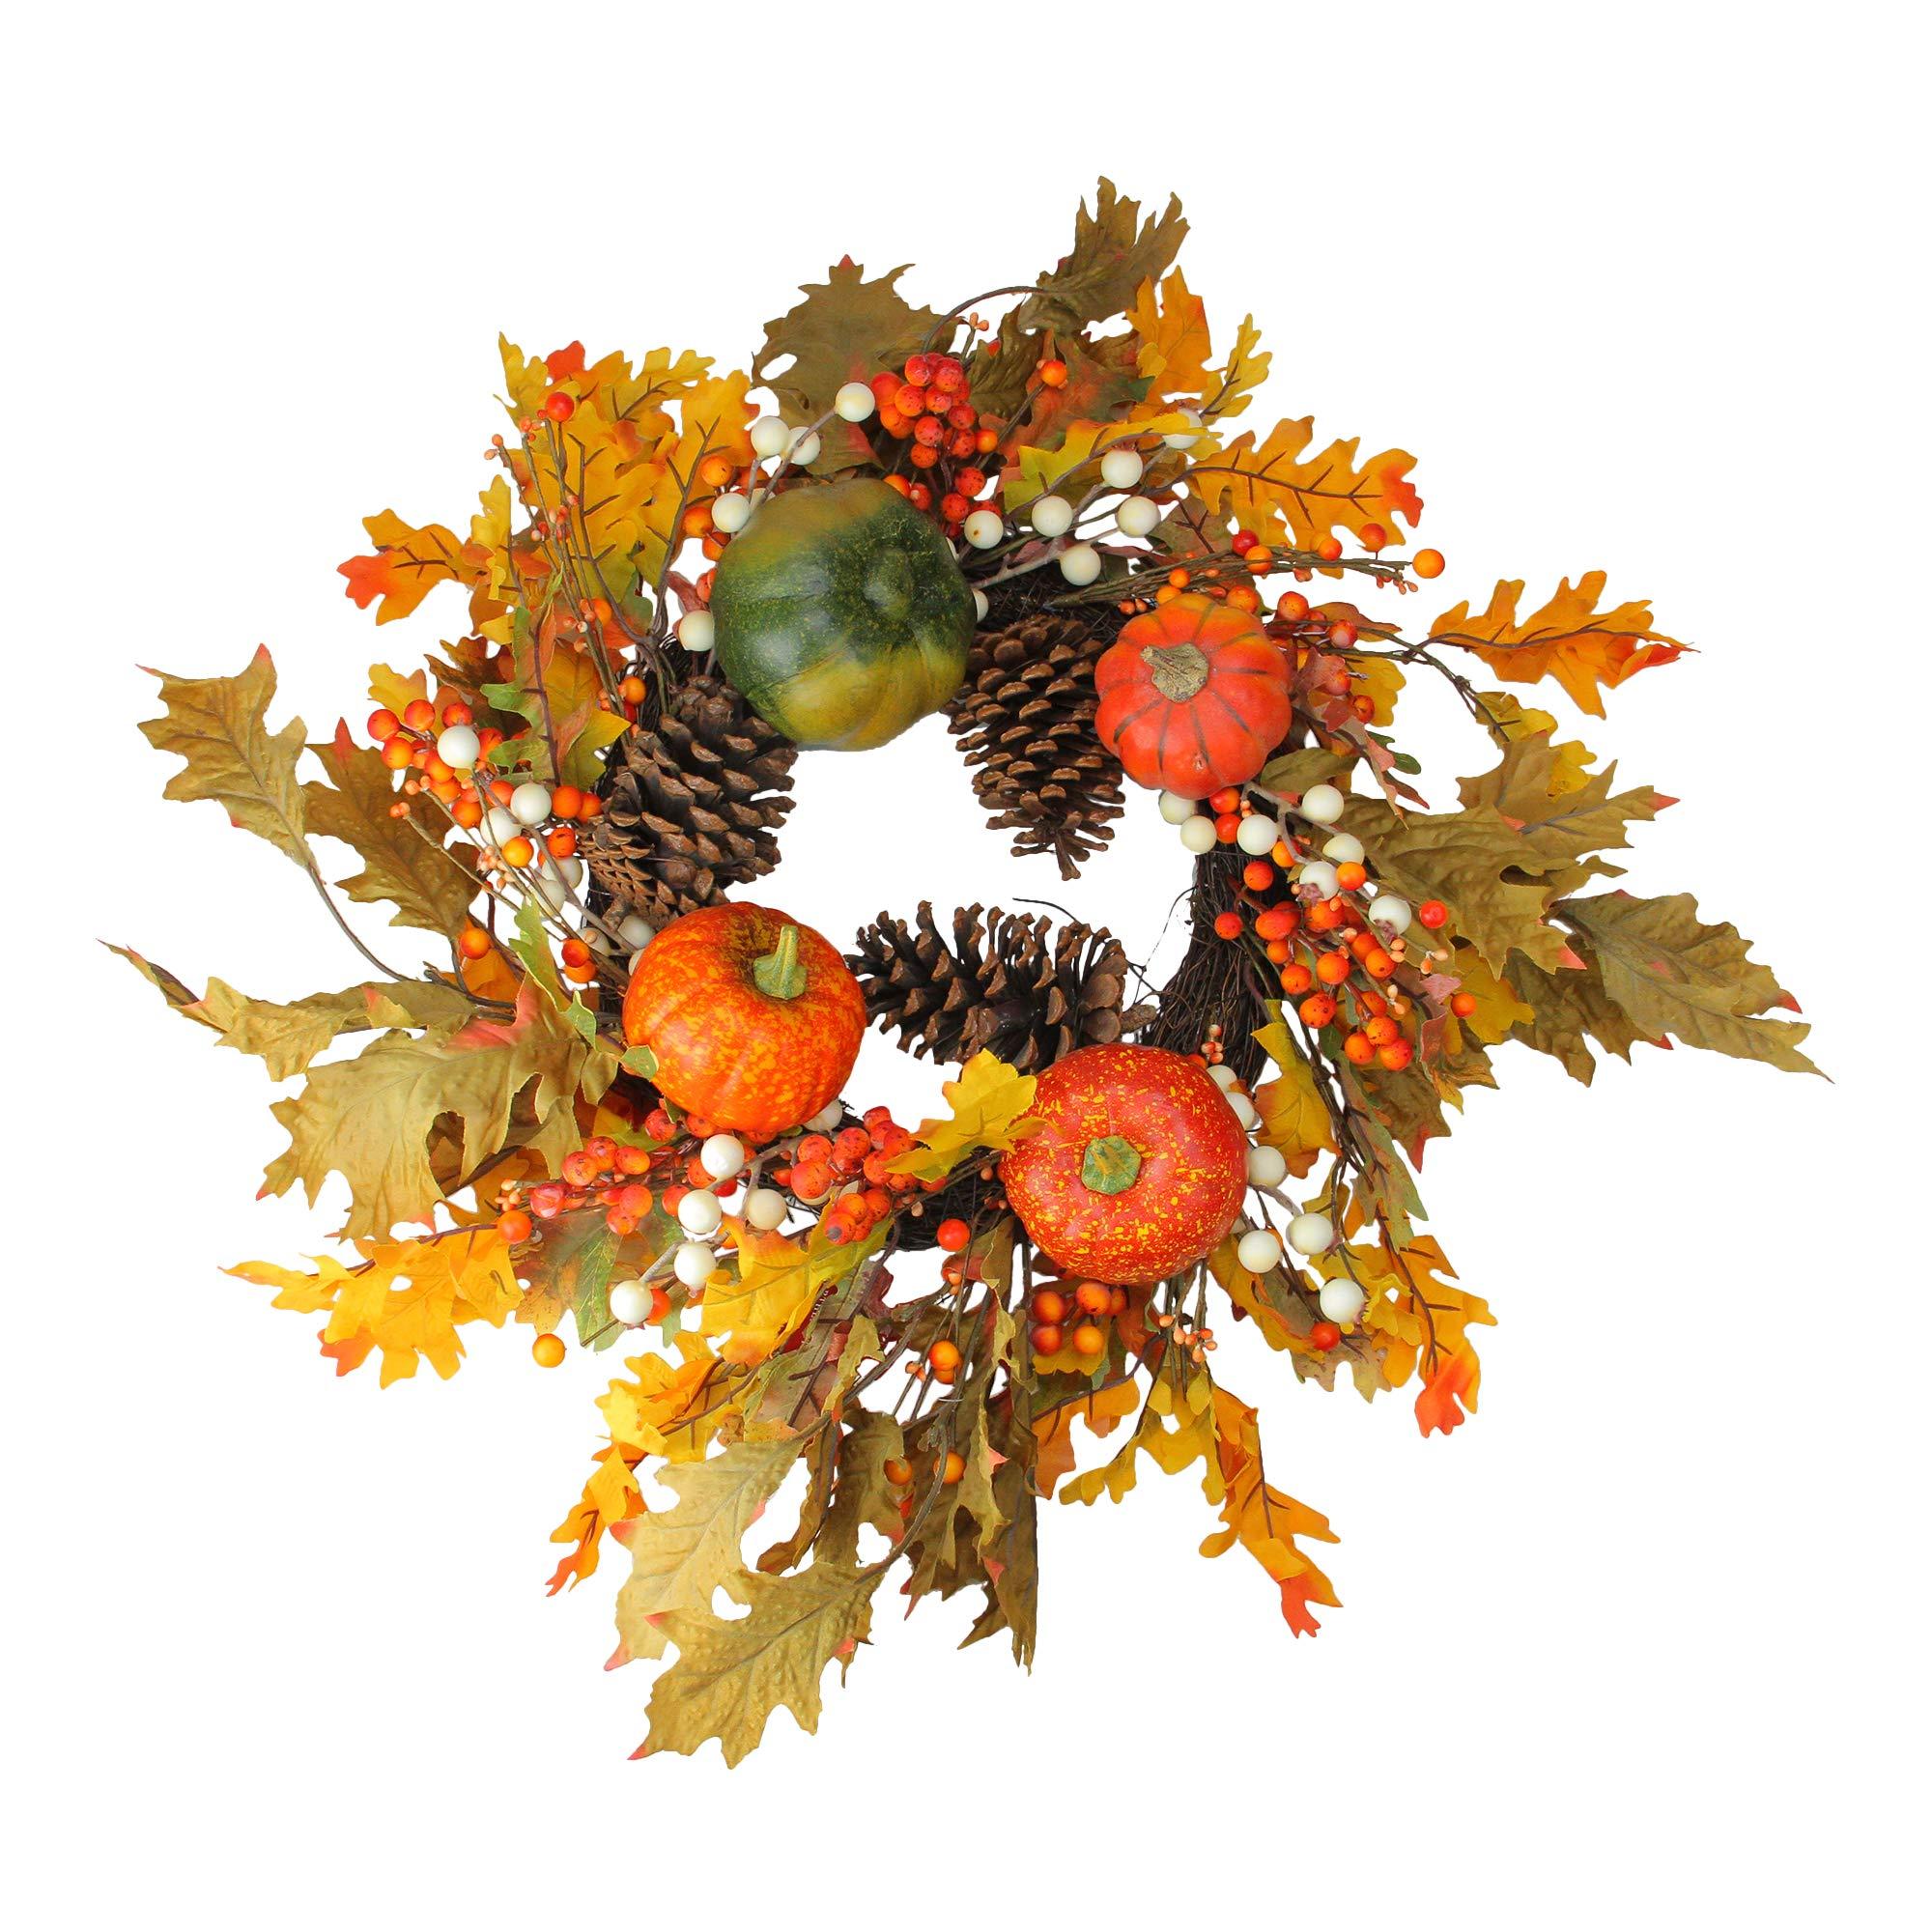 NORTHLIGHT VM37832 24'' Autumn Harvest Decorative Artifi by Northlight